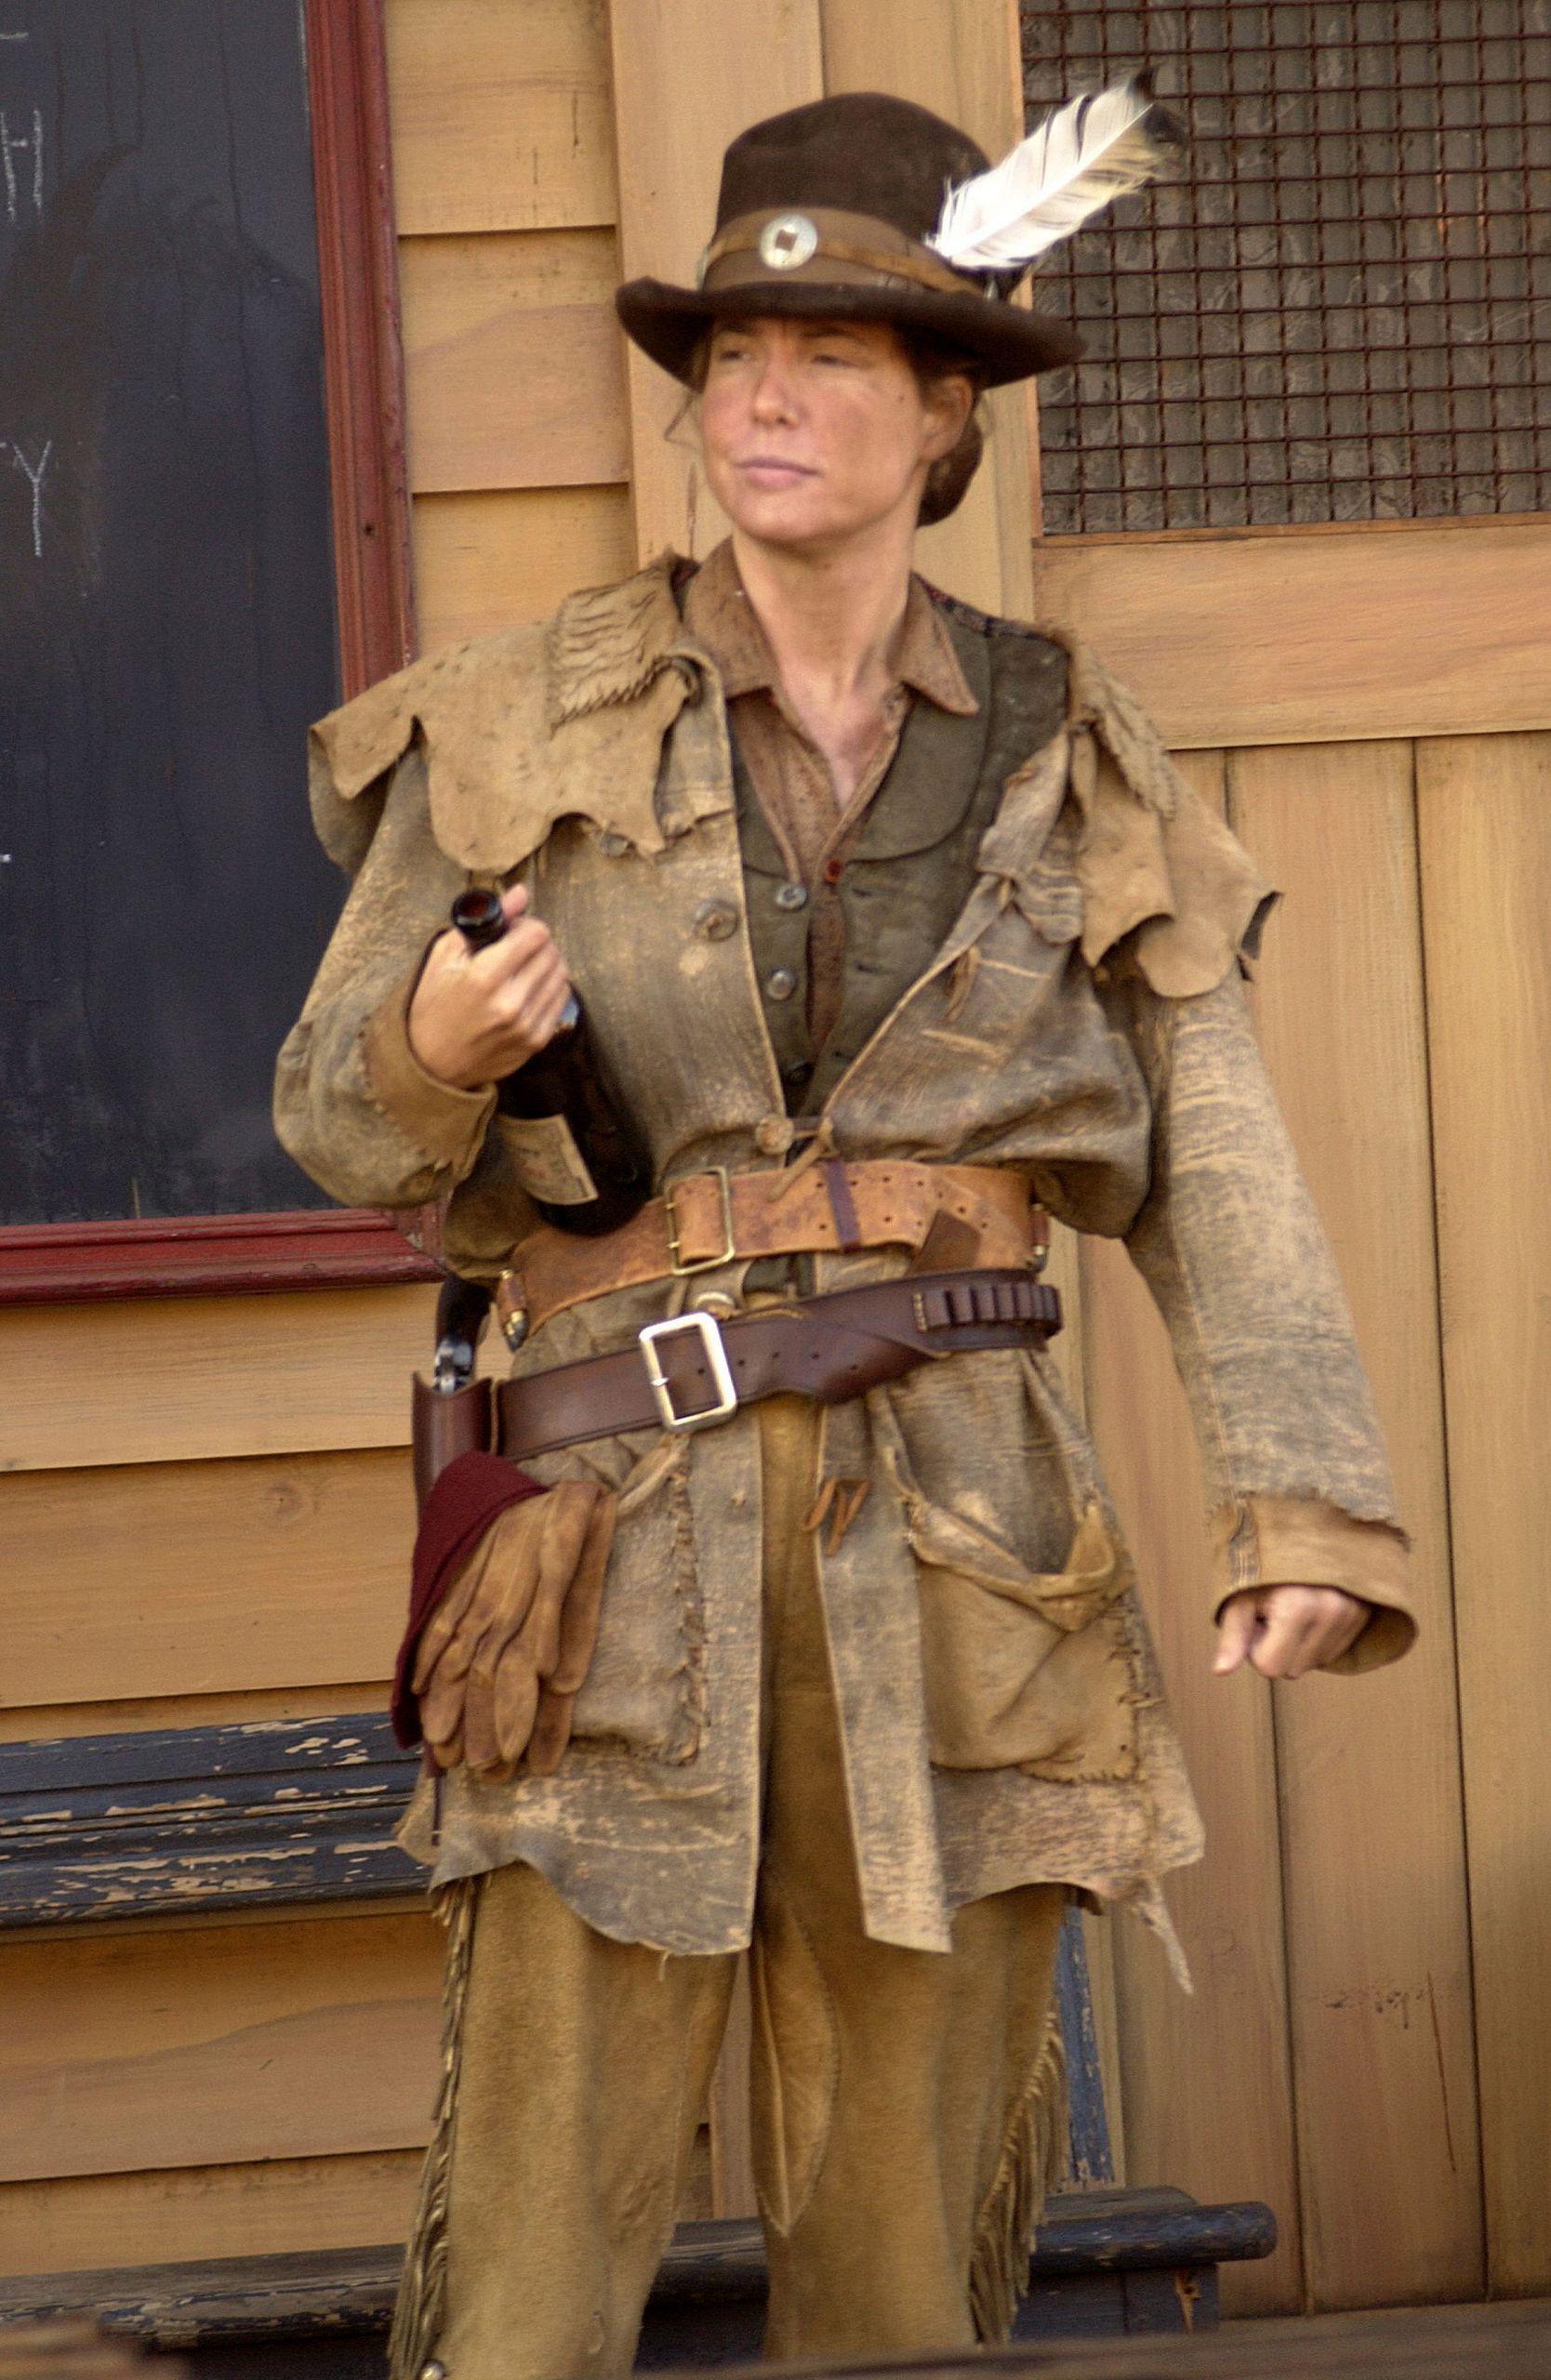 Amy Adams protagonizará el biopic de Janis Joplin Calamity-Jane-deadwood-20807664-1668-2560